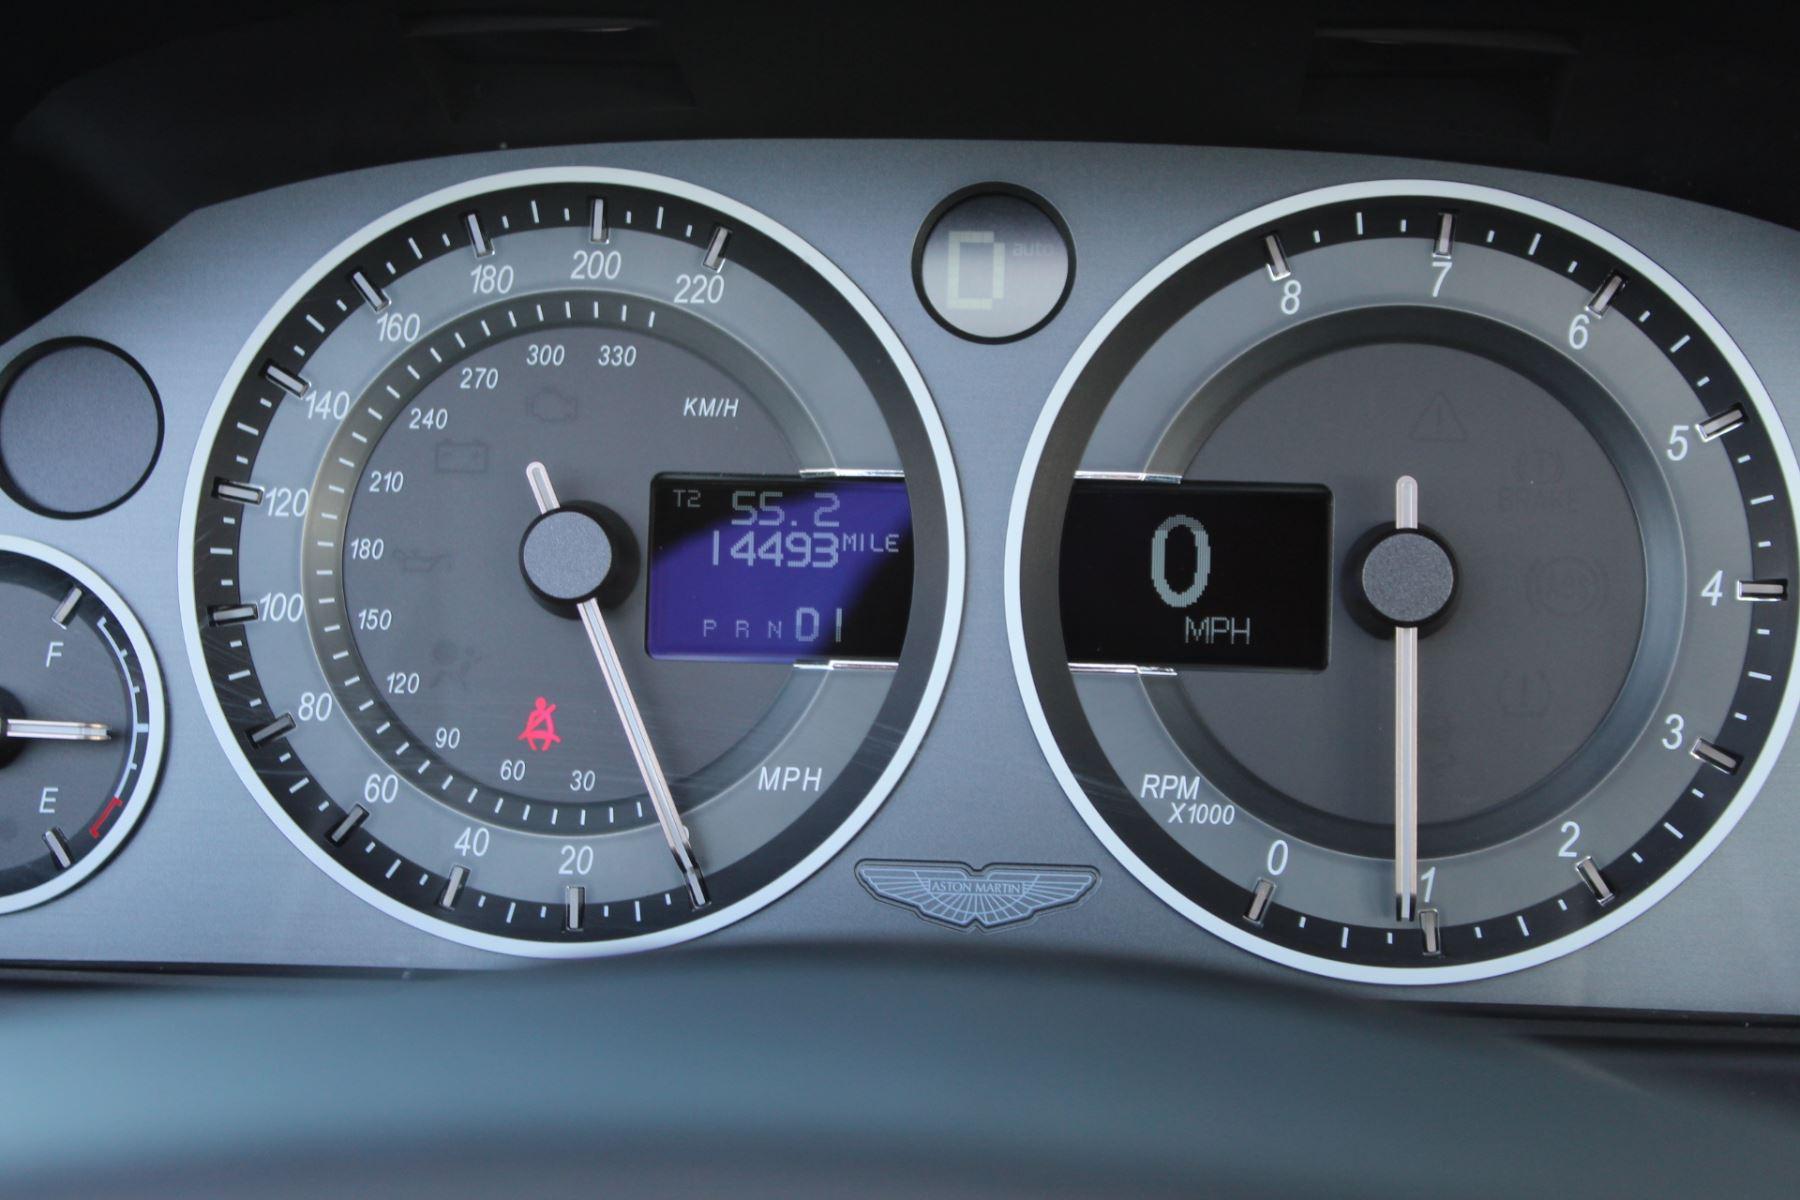 Aston Martin DB9 V12 2dr Volante Touchtronic [470] image 13